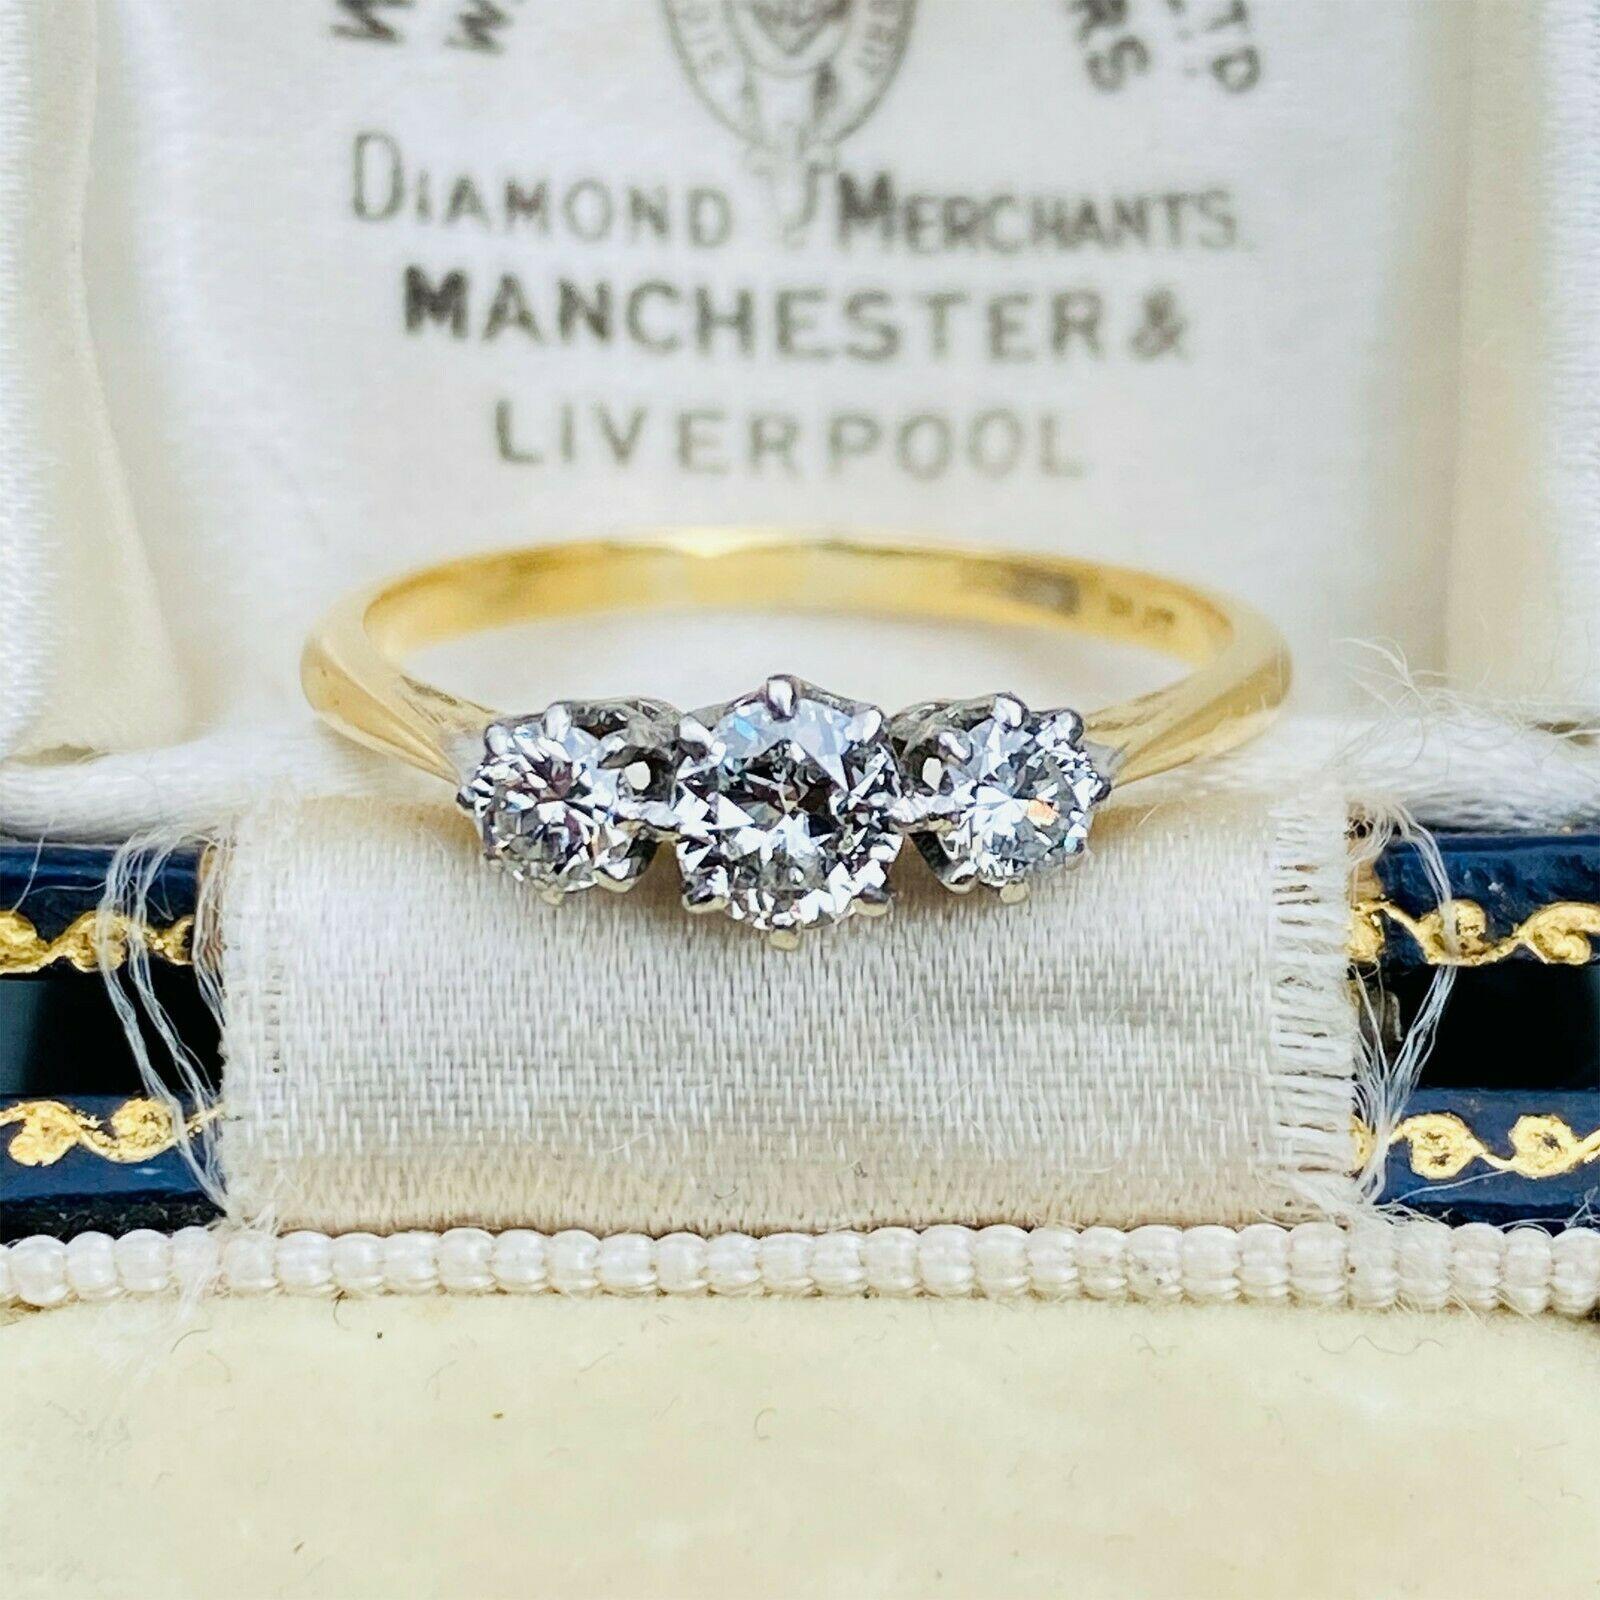 Art Deco, 18ct, 18k, 750 Gold & Platinum Diamond, three stone engagement ring